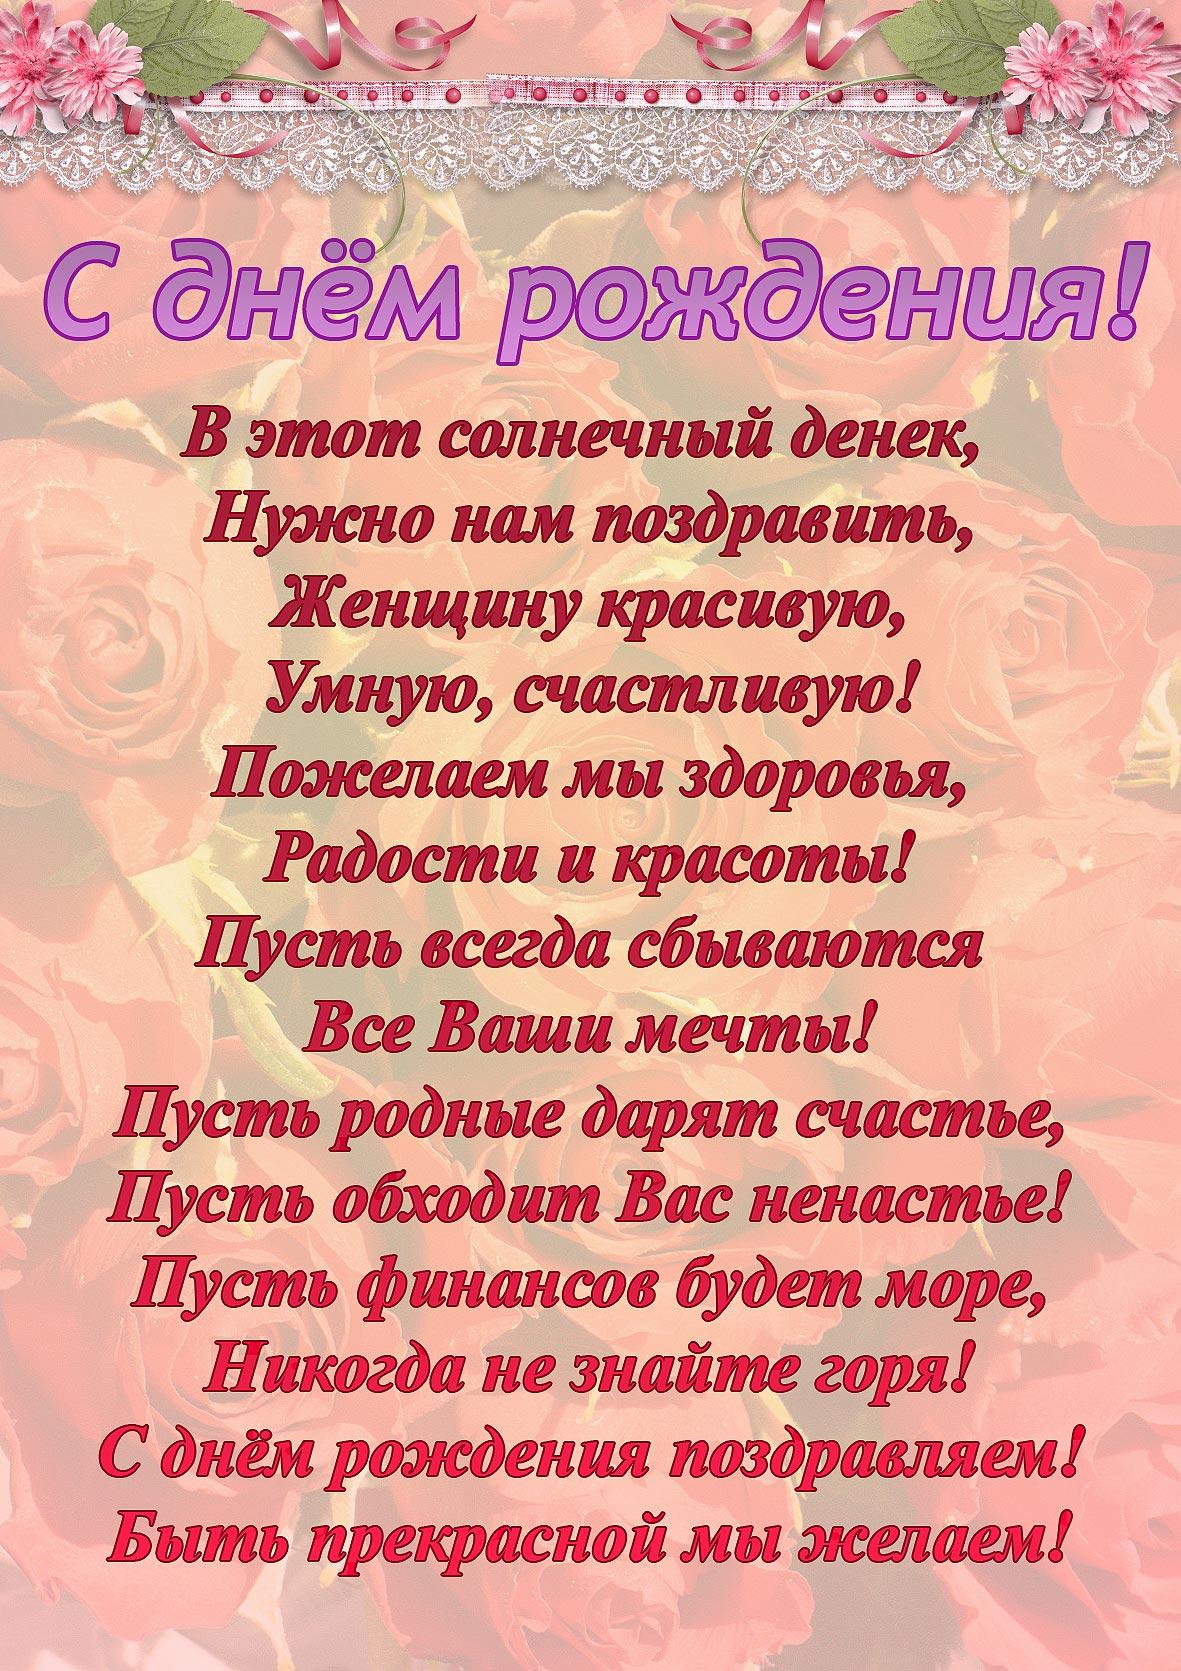 http://prazdnik-i-ko.ru/uploads/posts/2012-05/1338118596_8.jpg